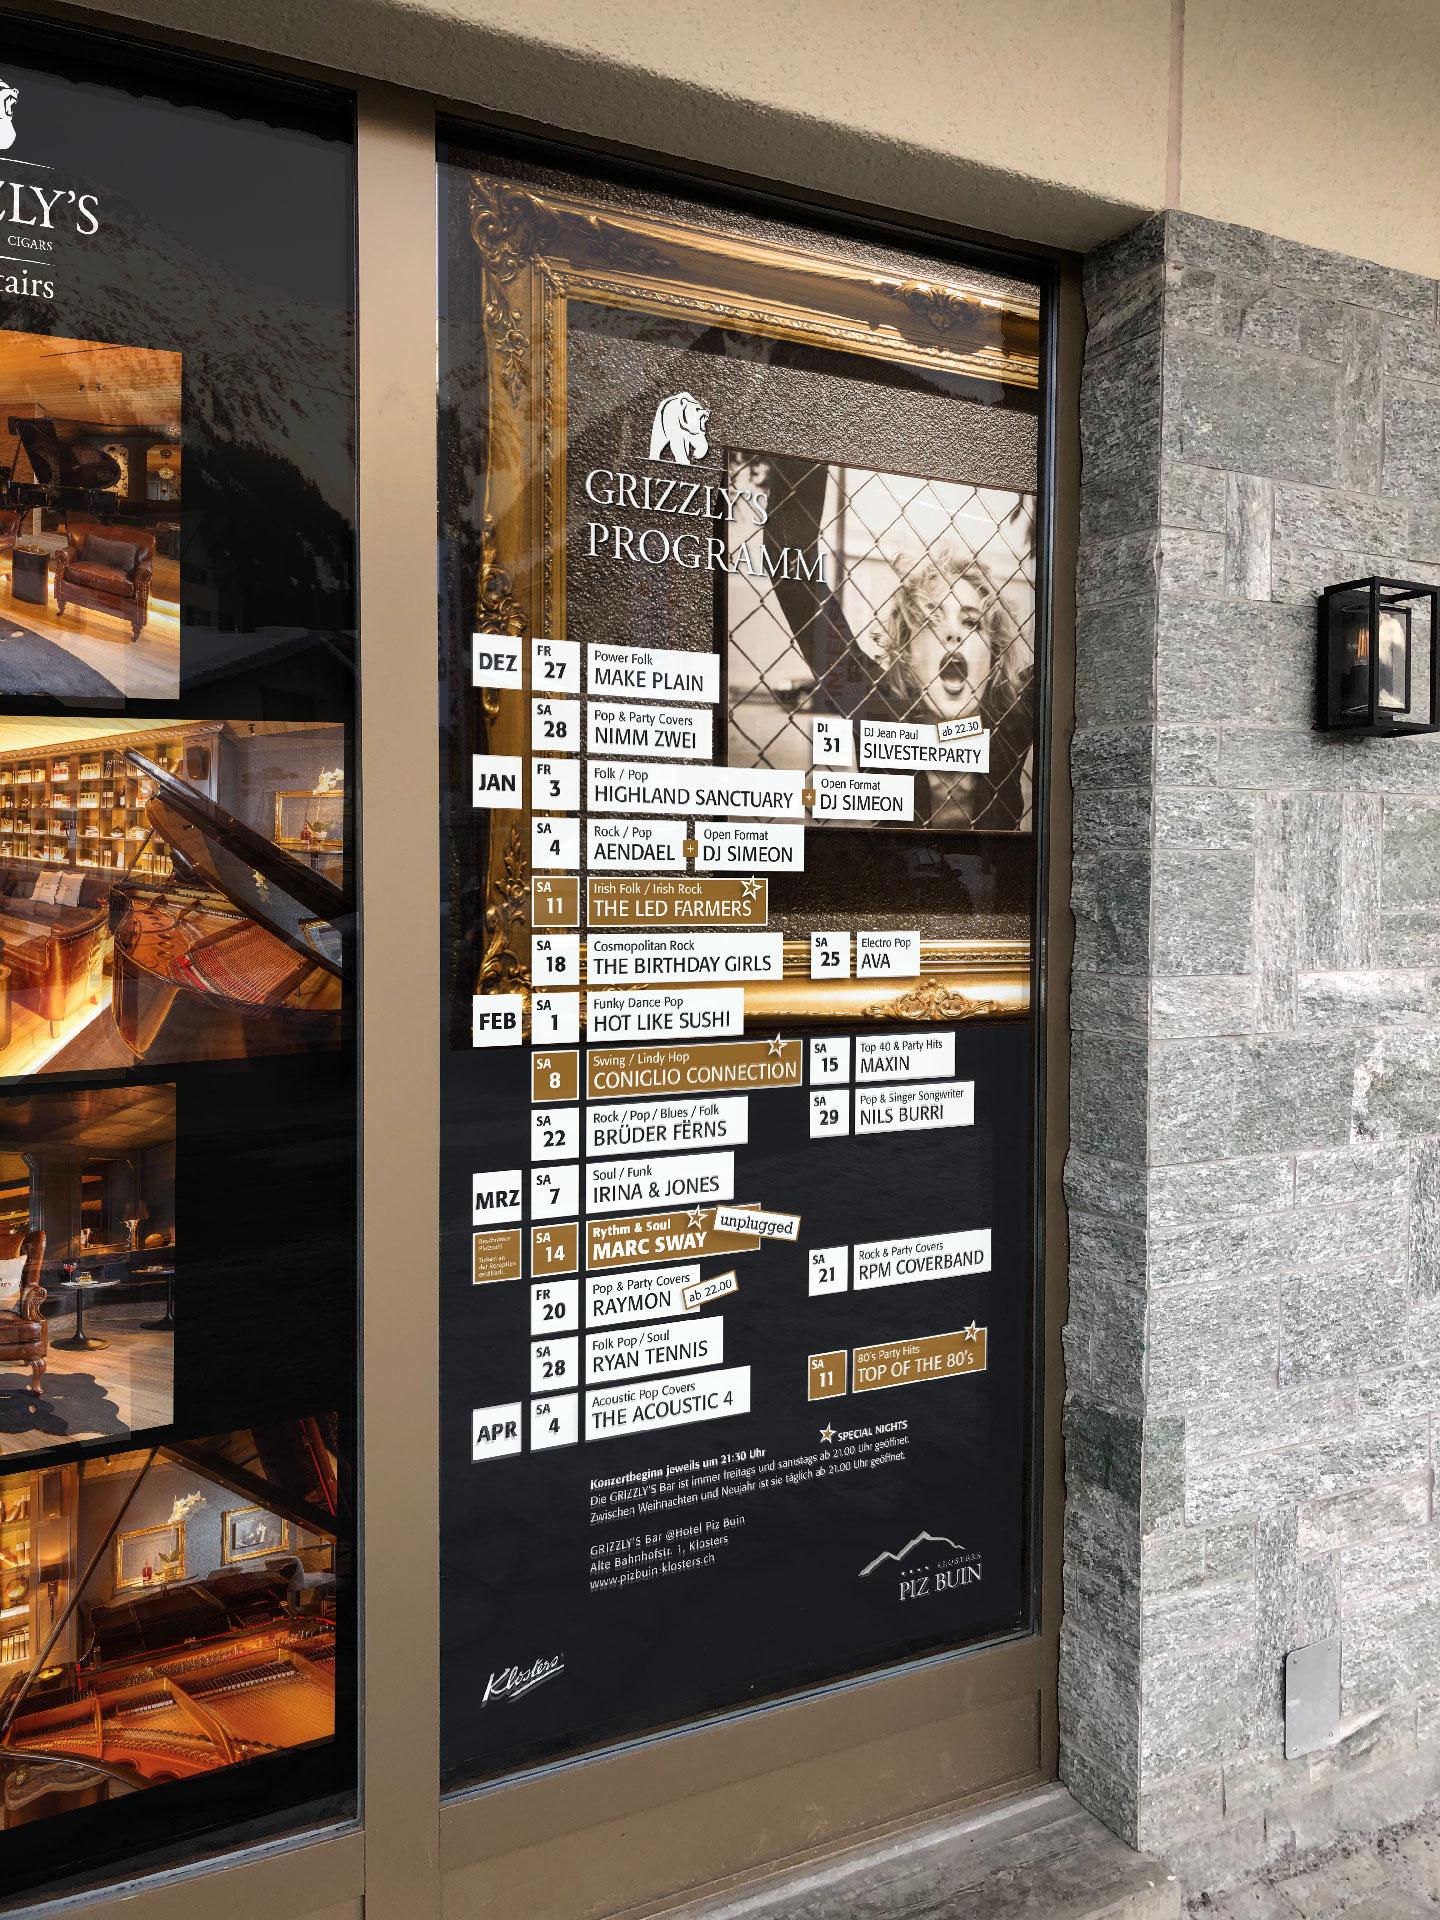 Konzertplakat Grizzly's Bar Hotel Piz Buin Klosters by uniik.com